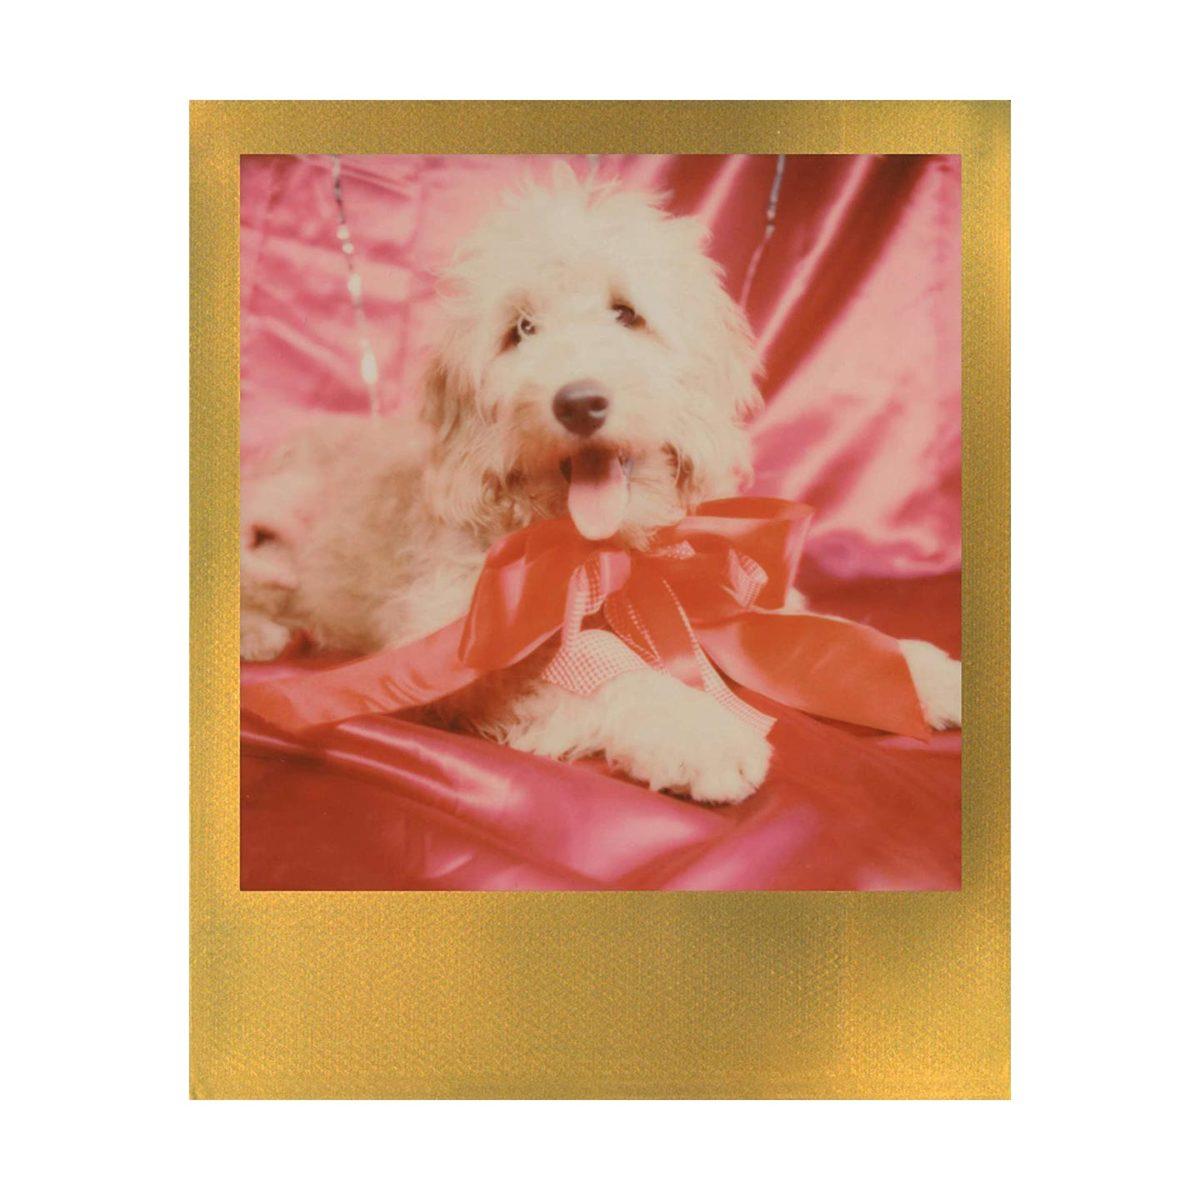 polaroid_600_color_film_gold_frame_03